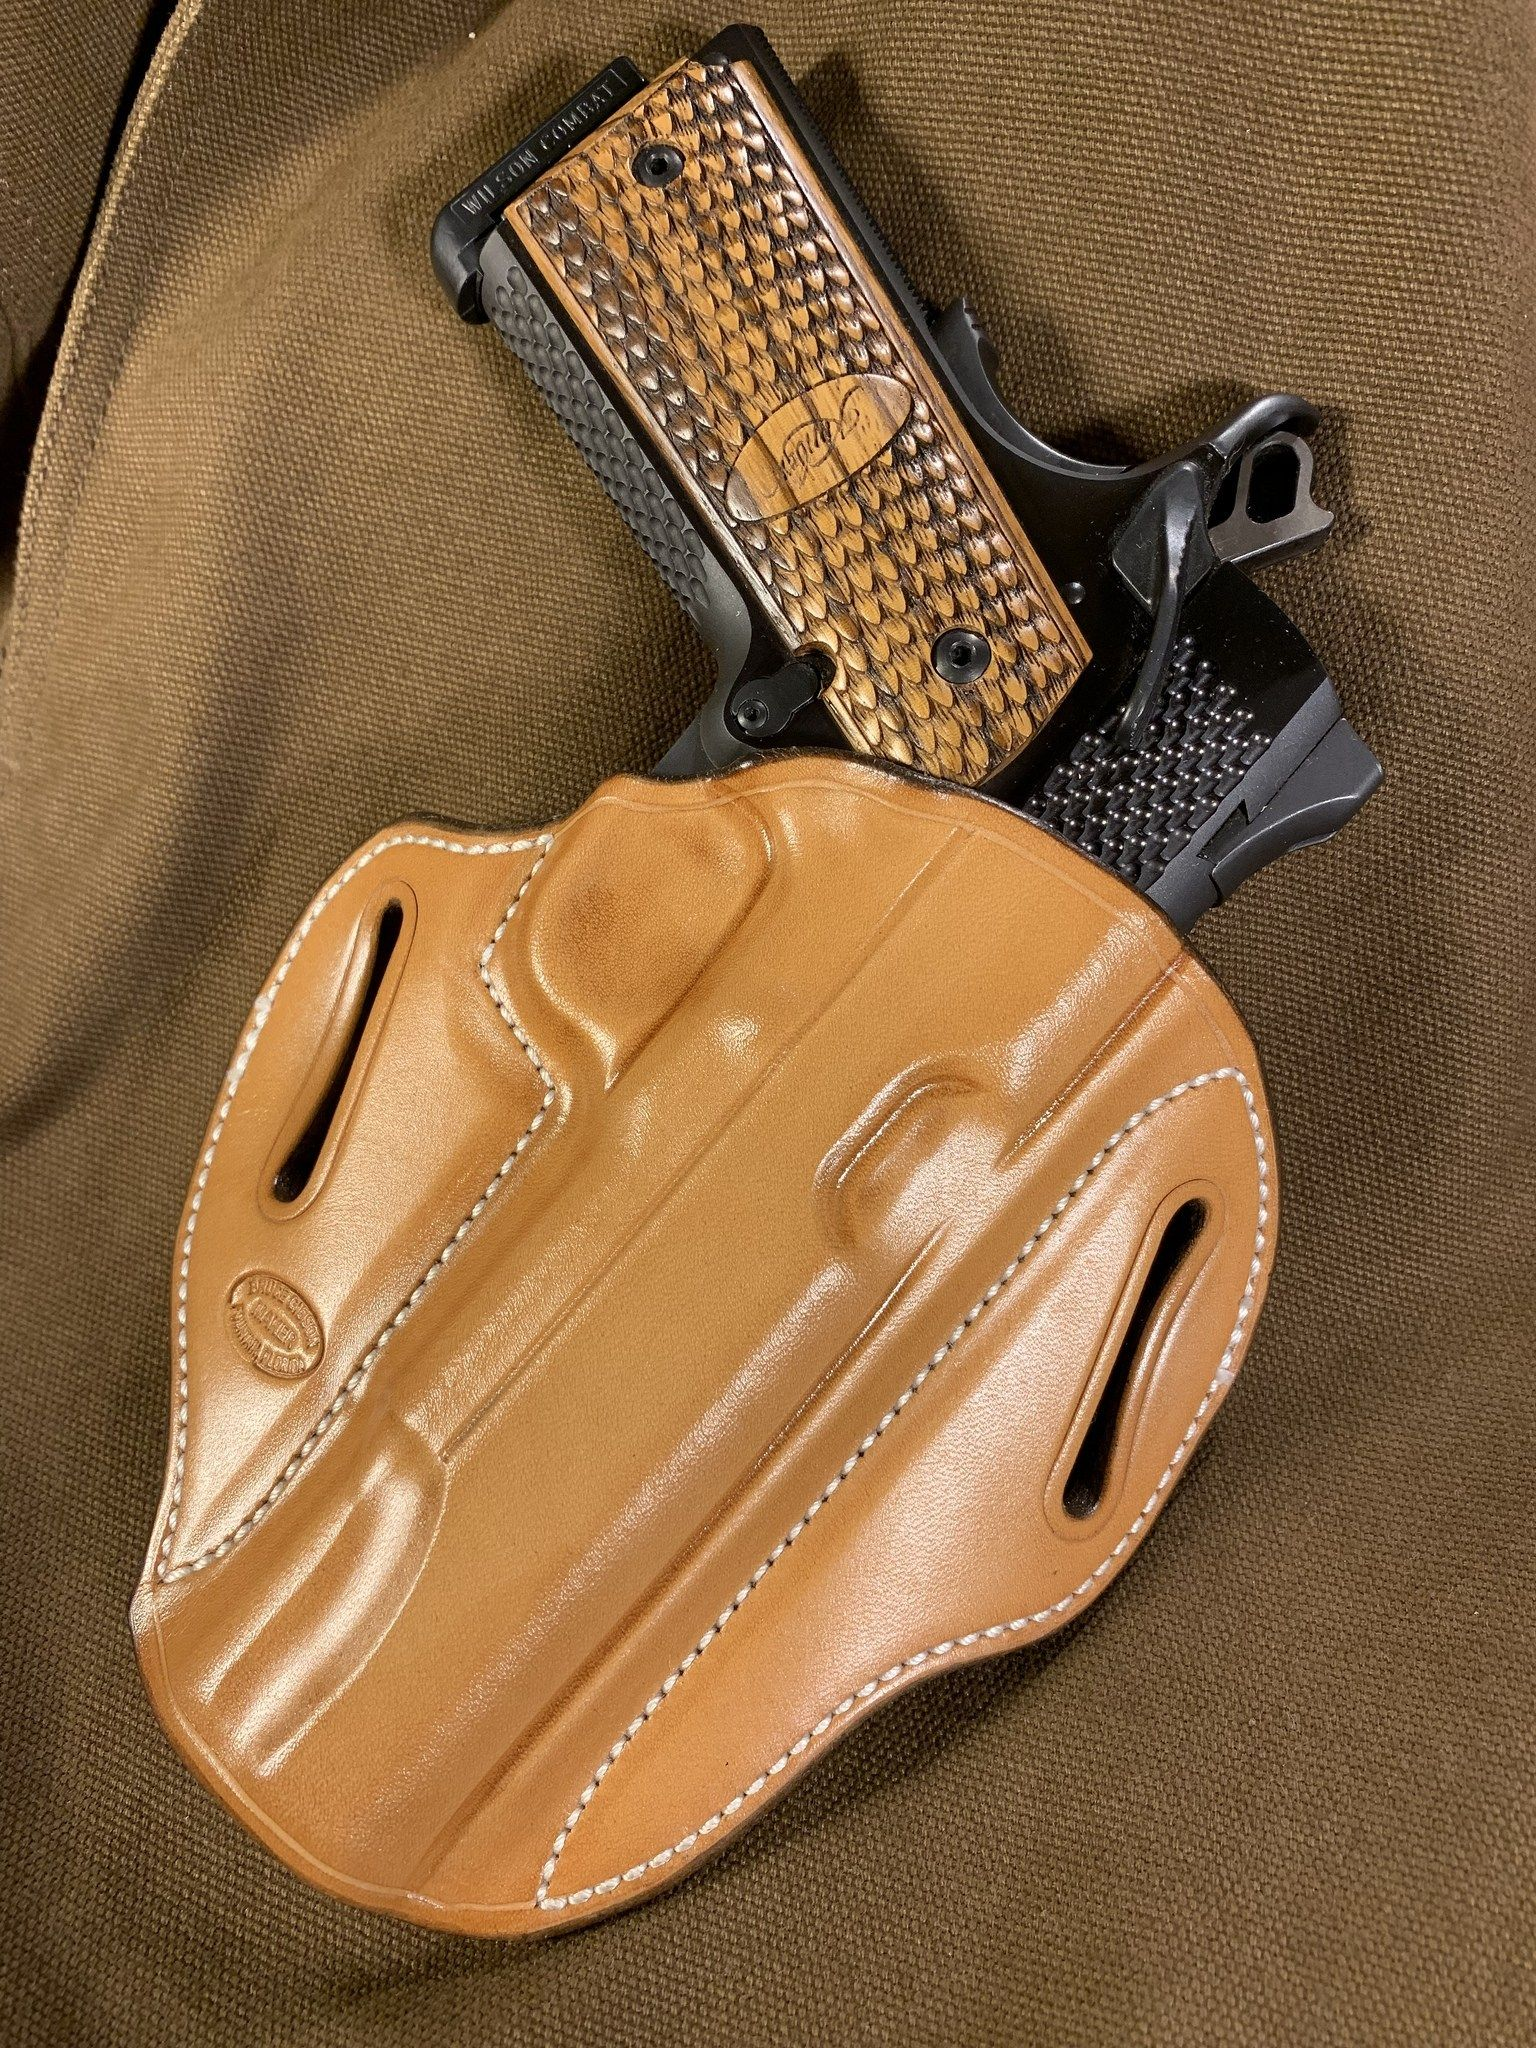 Gibson Natural 1911 5 Inch Full Size Right Hand Owb Belt Slide